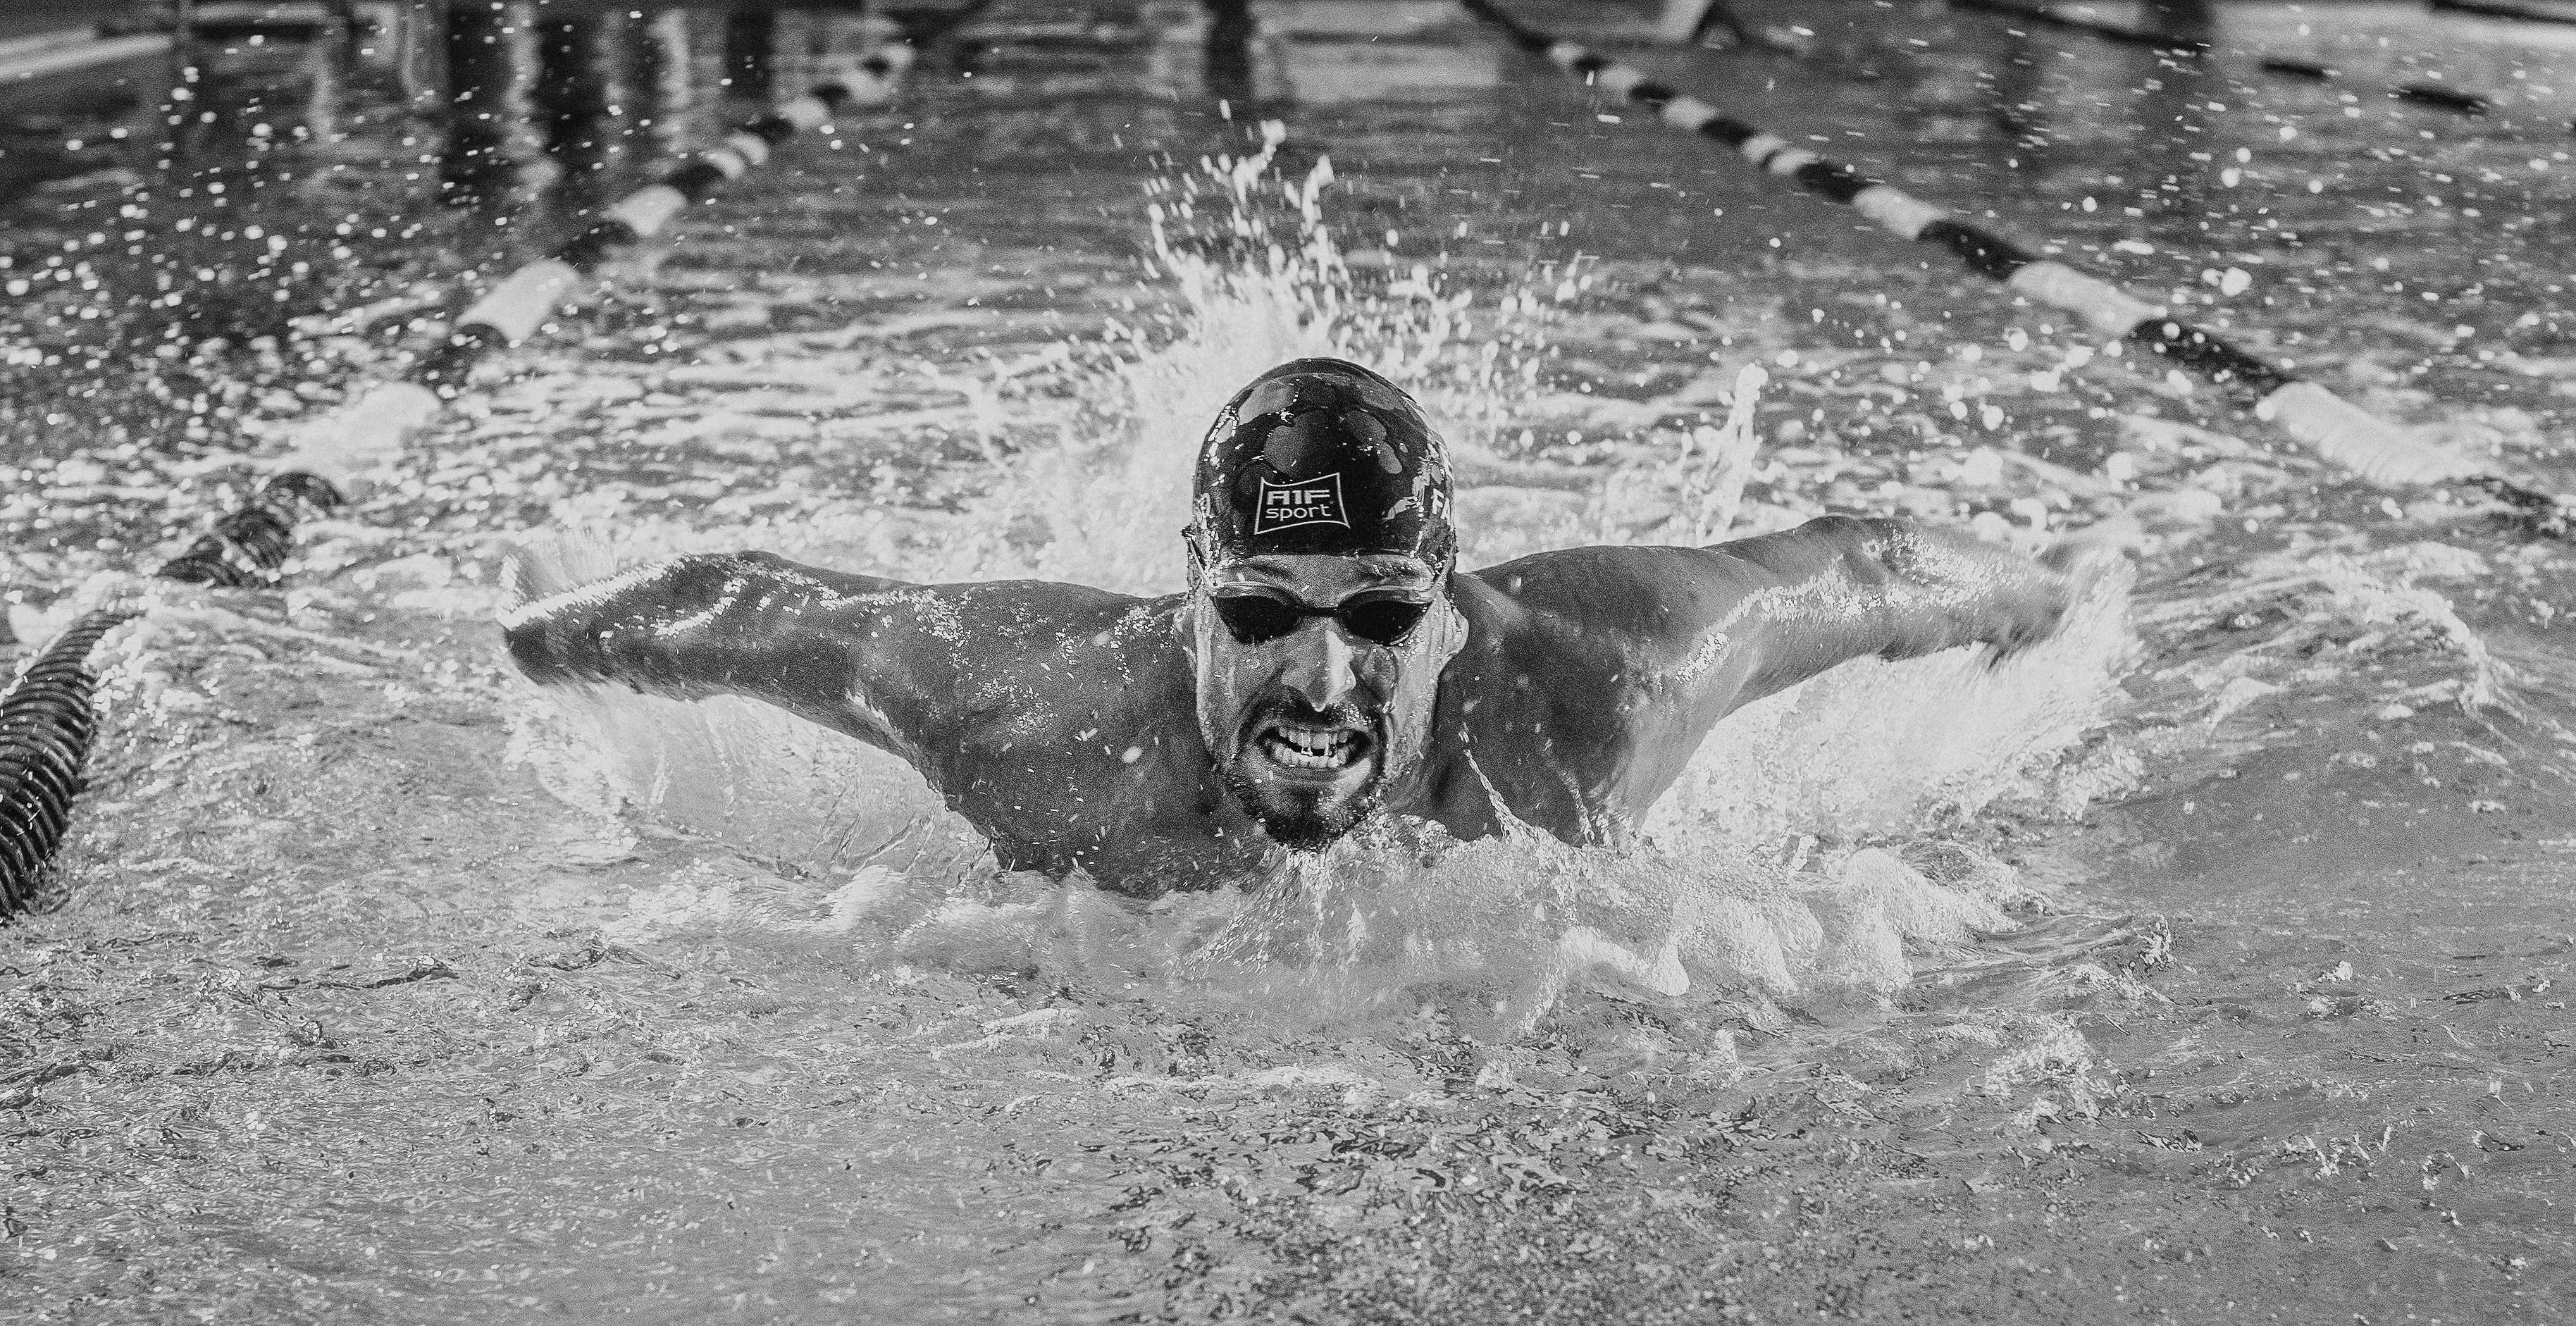 Faustino Afonso, campeón de España de 50, 100, 200, 400 en estilo libre, además de 50 mariposa. (FOTO: Joaquín Ponce de León)